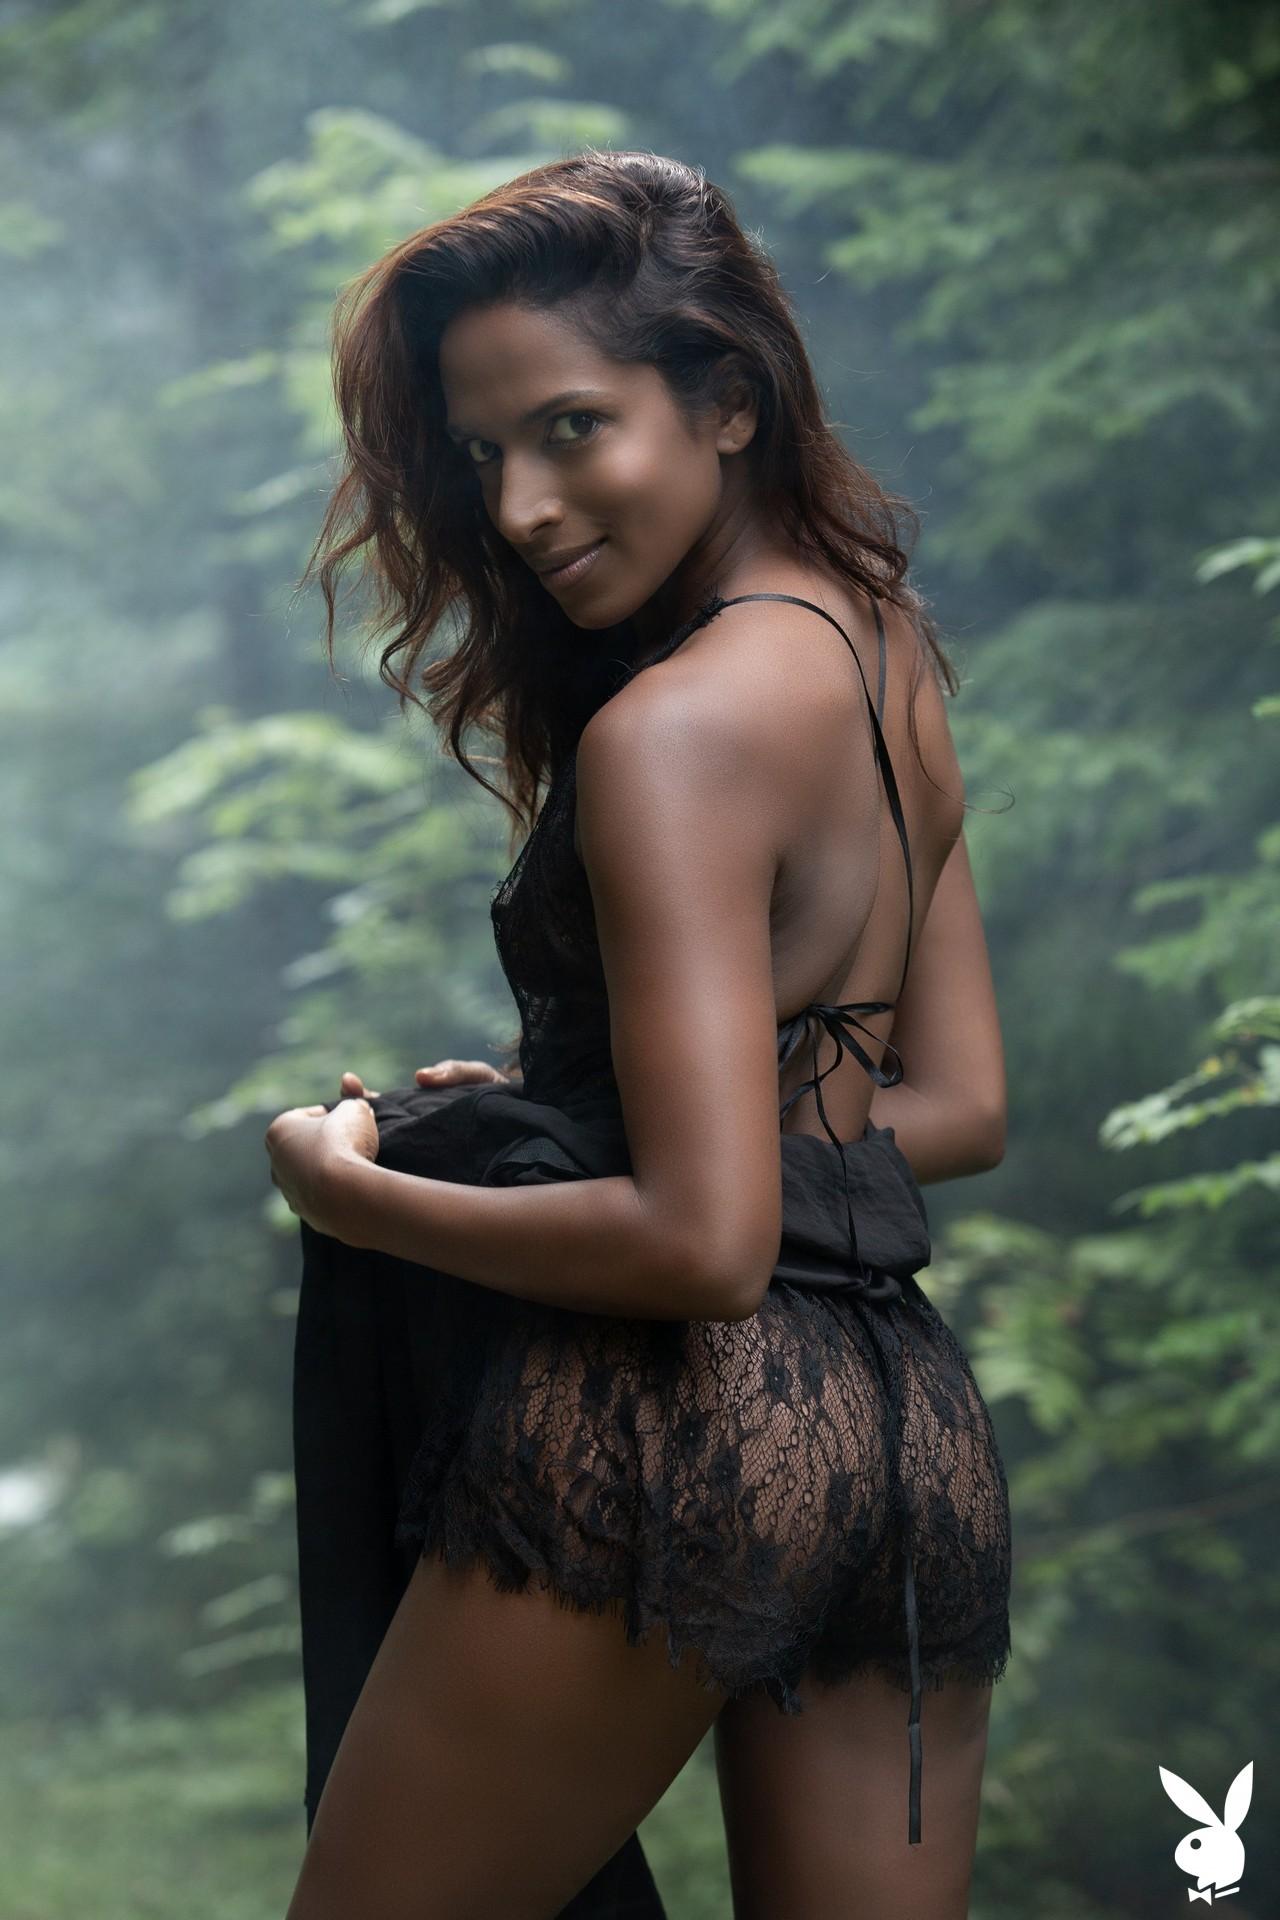 Nirmala Fernandes For Playboy Plus In Natural Impulse-3641